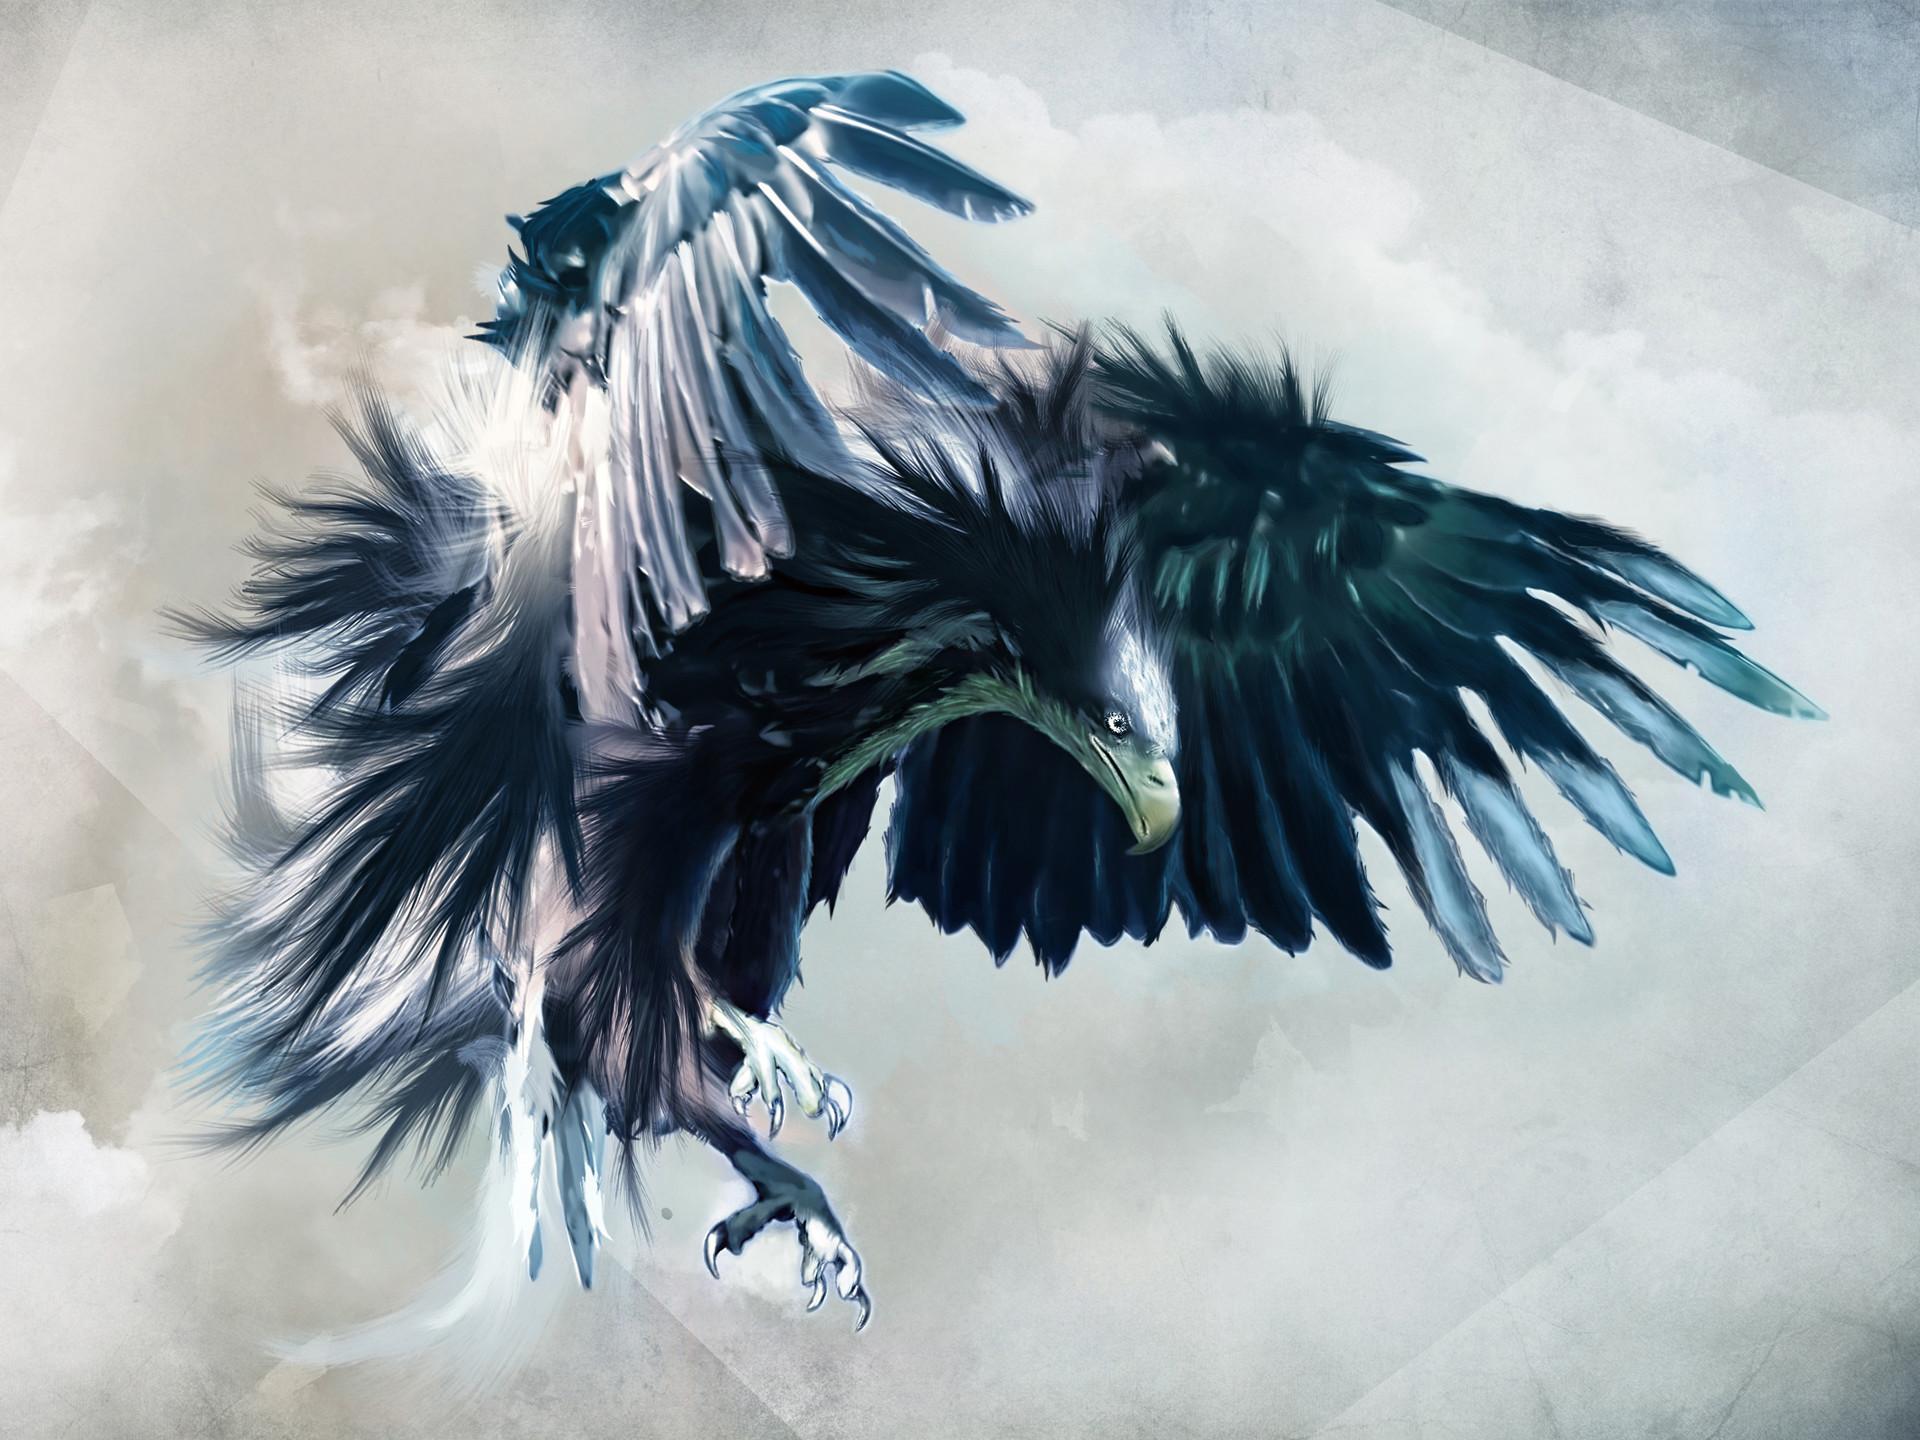 Fierce Eagle HD Wallpaper on MobDecor